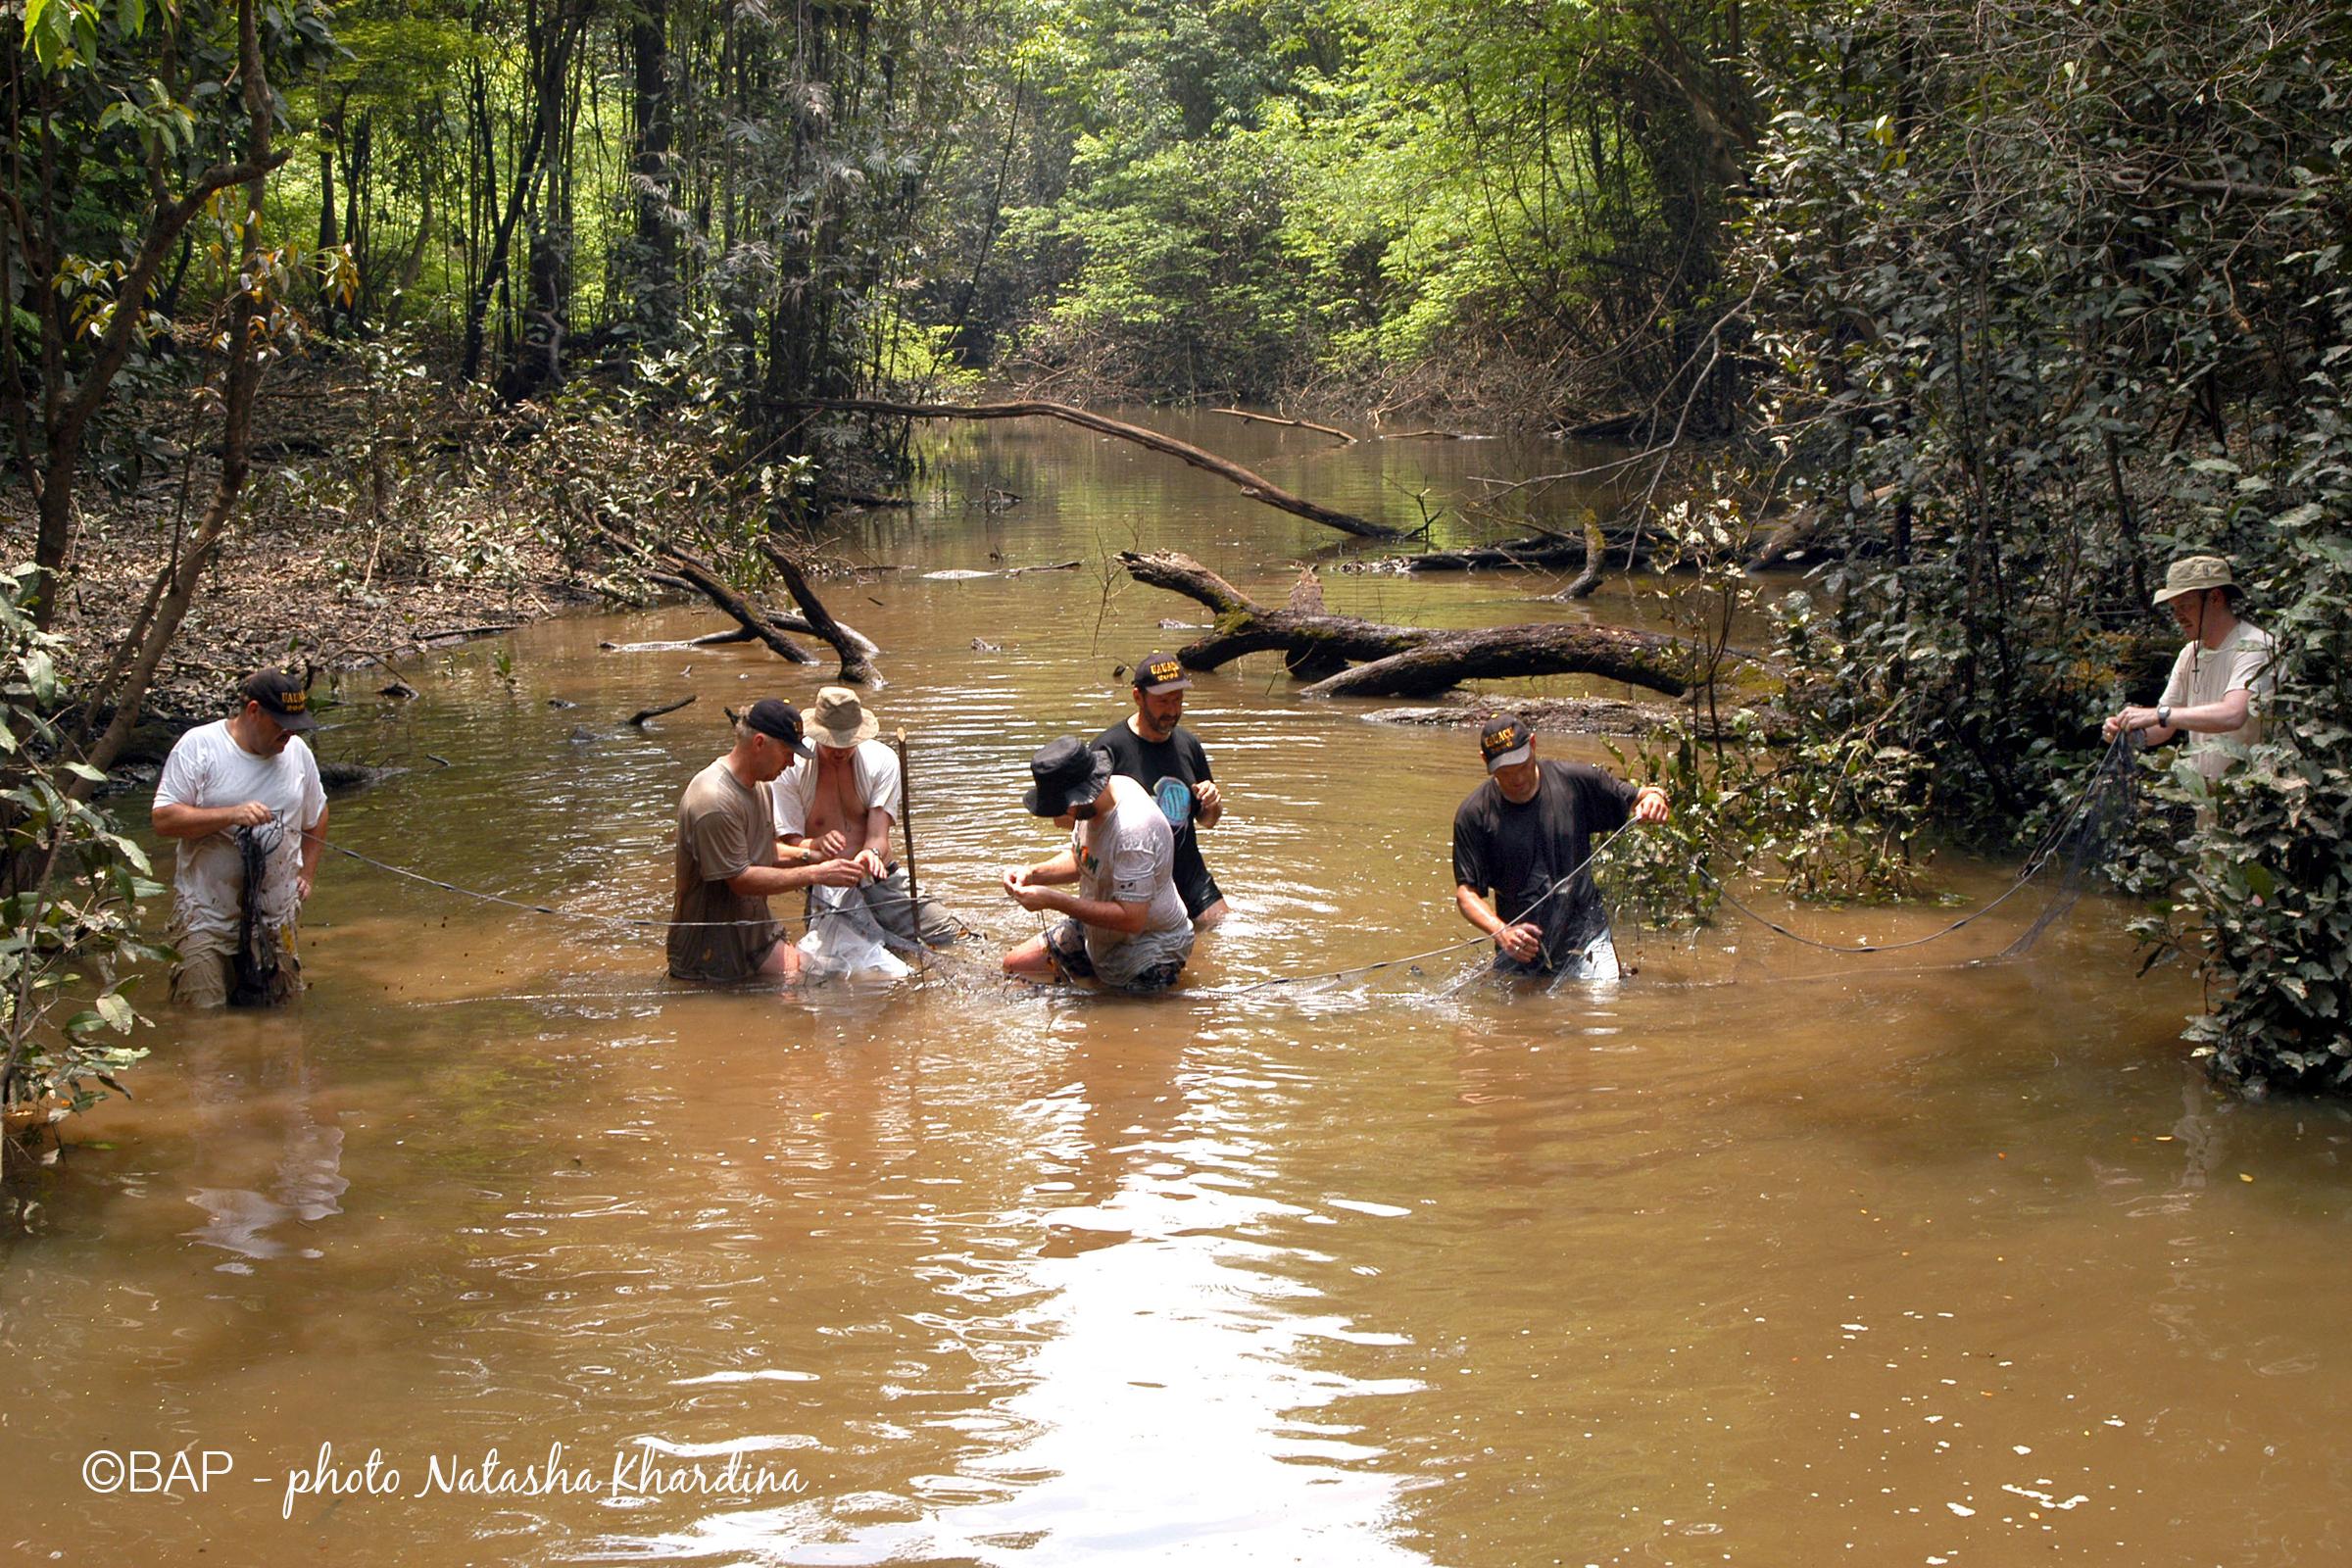 2nd expedition, Lago Aiapuà affluent, Brazil. ©BAP, photo N. Khardina